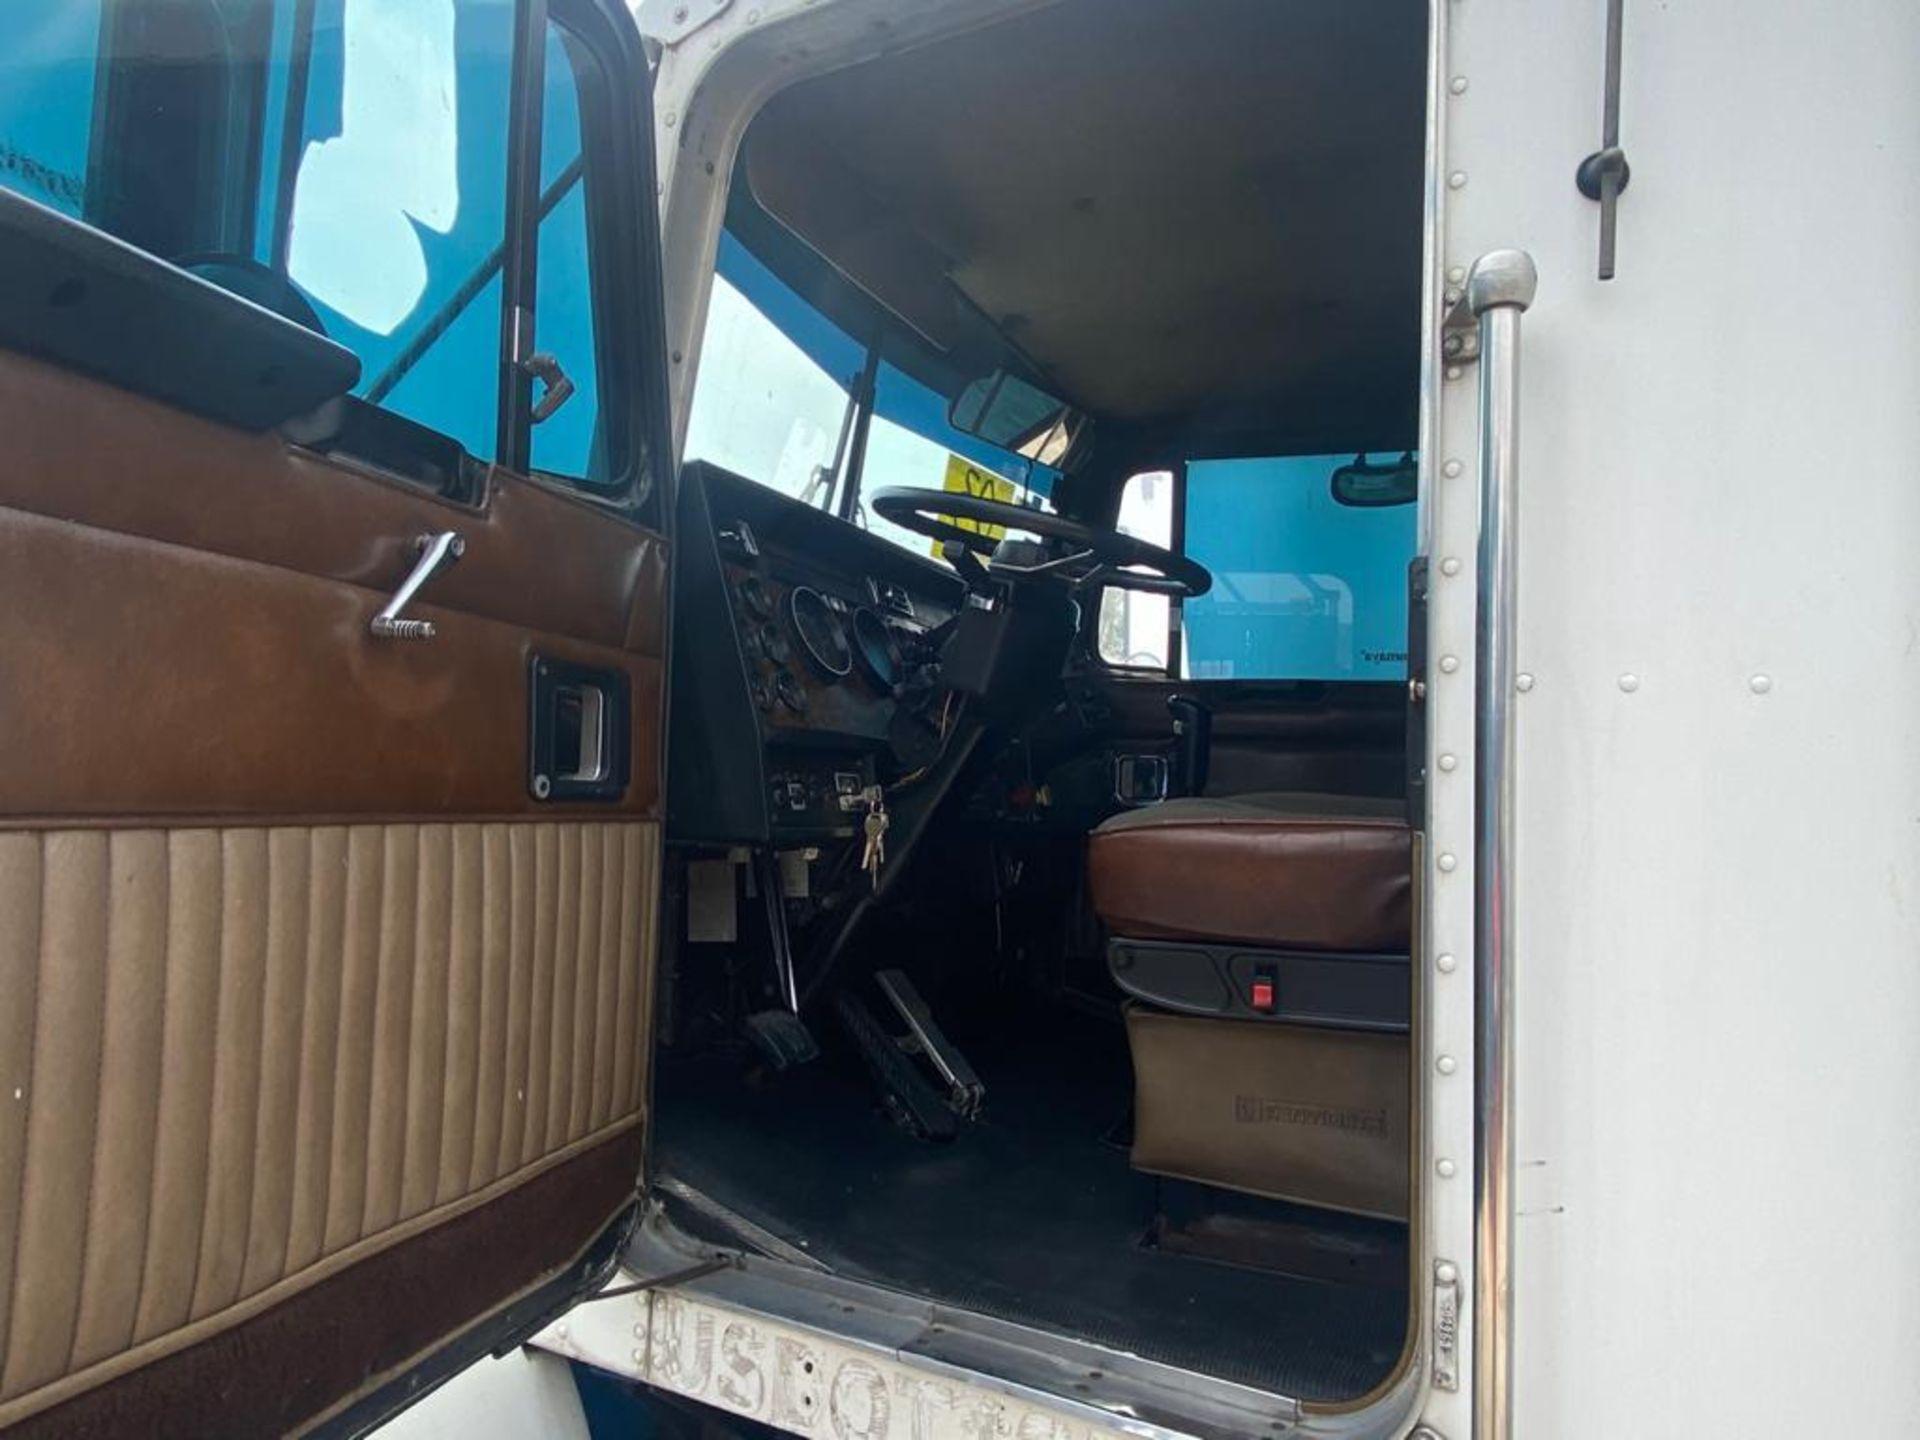 1999 Kenworth Sleeper truck tractor, standard transmission of 18 speeds - Image 24 of 62